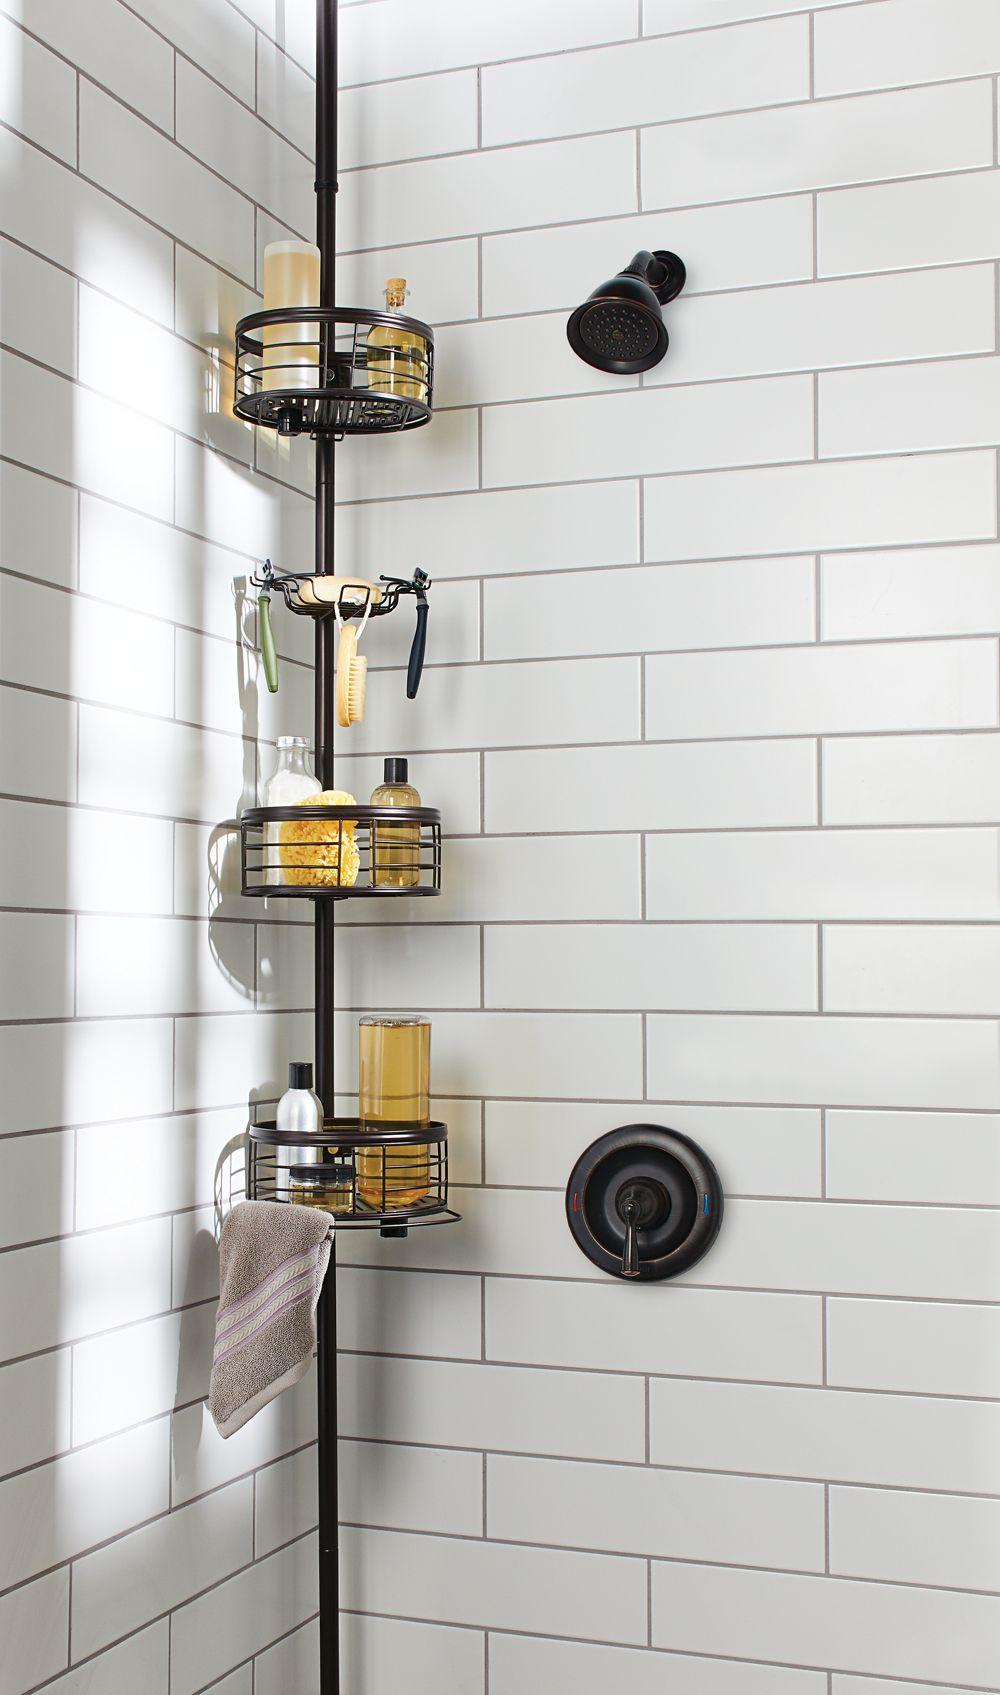 Home Shower Caddy Shower Shelves Shower Storage